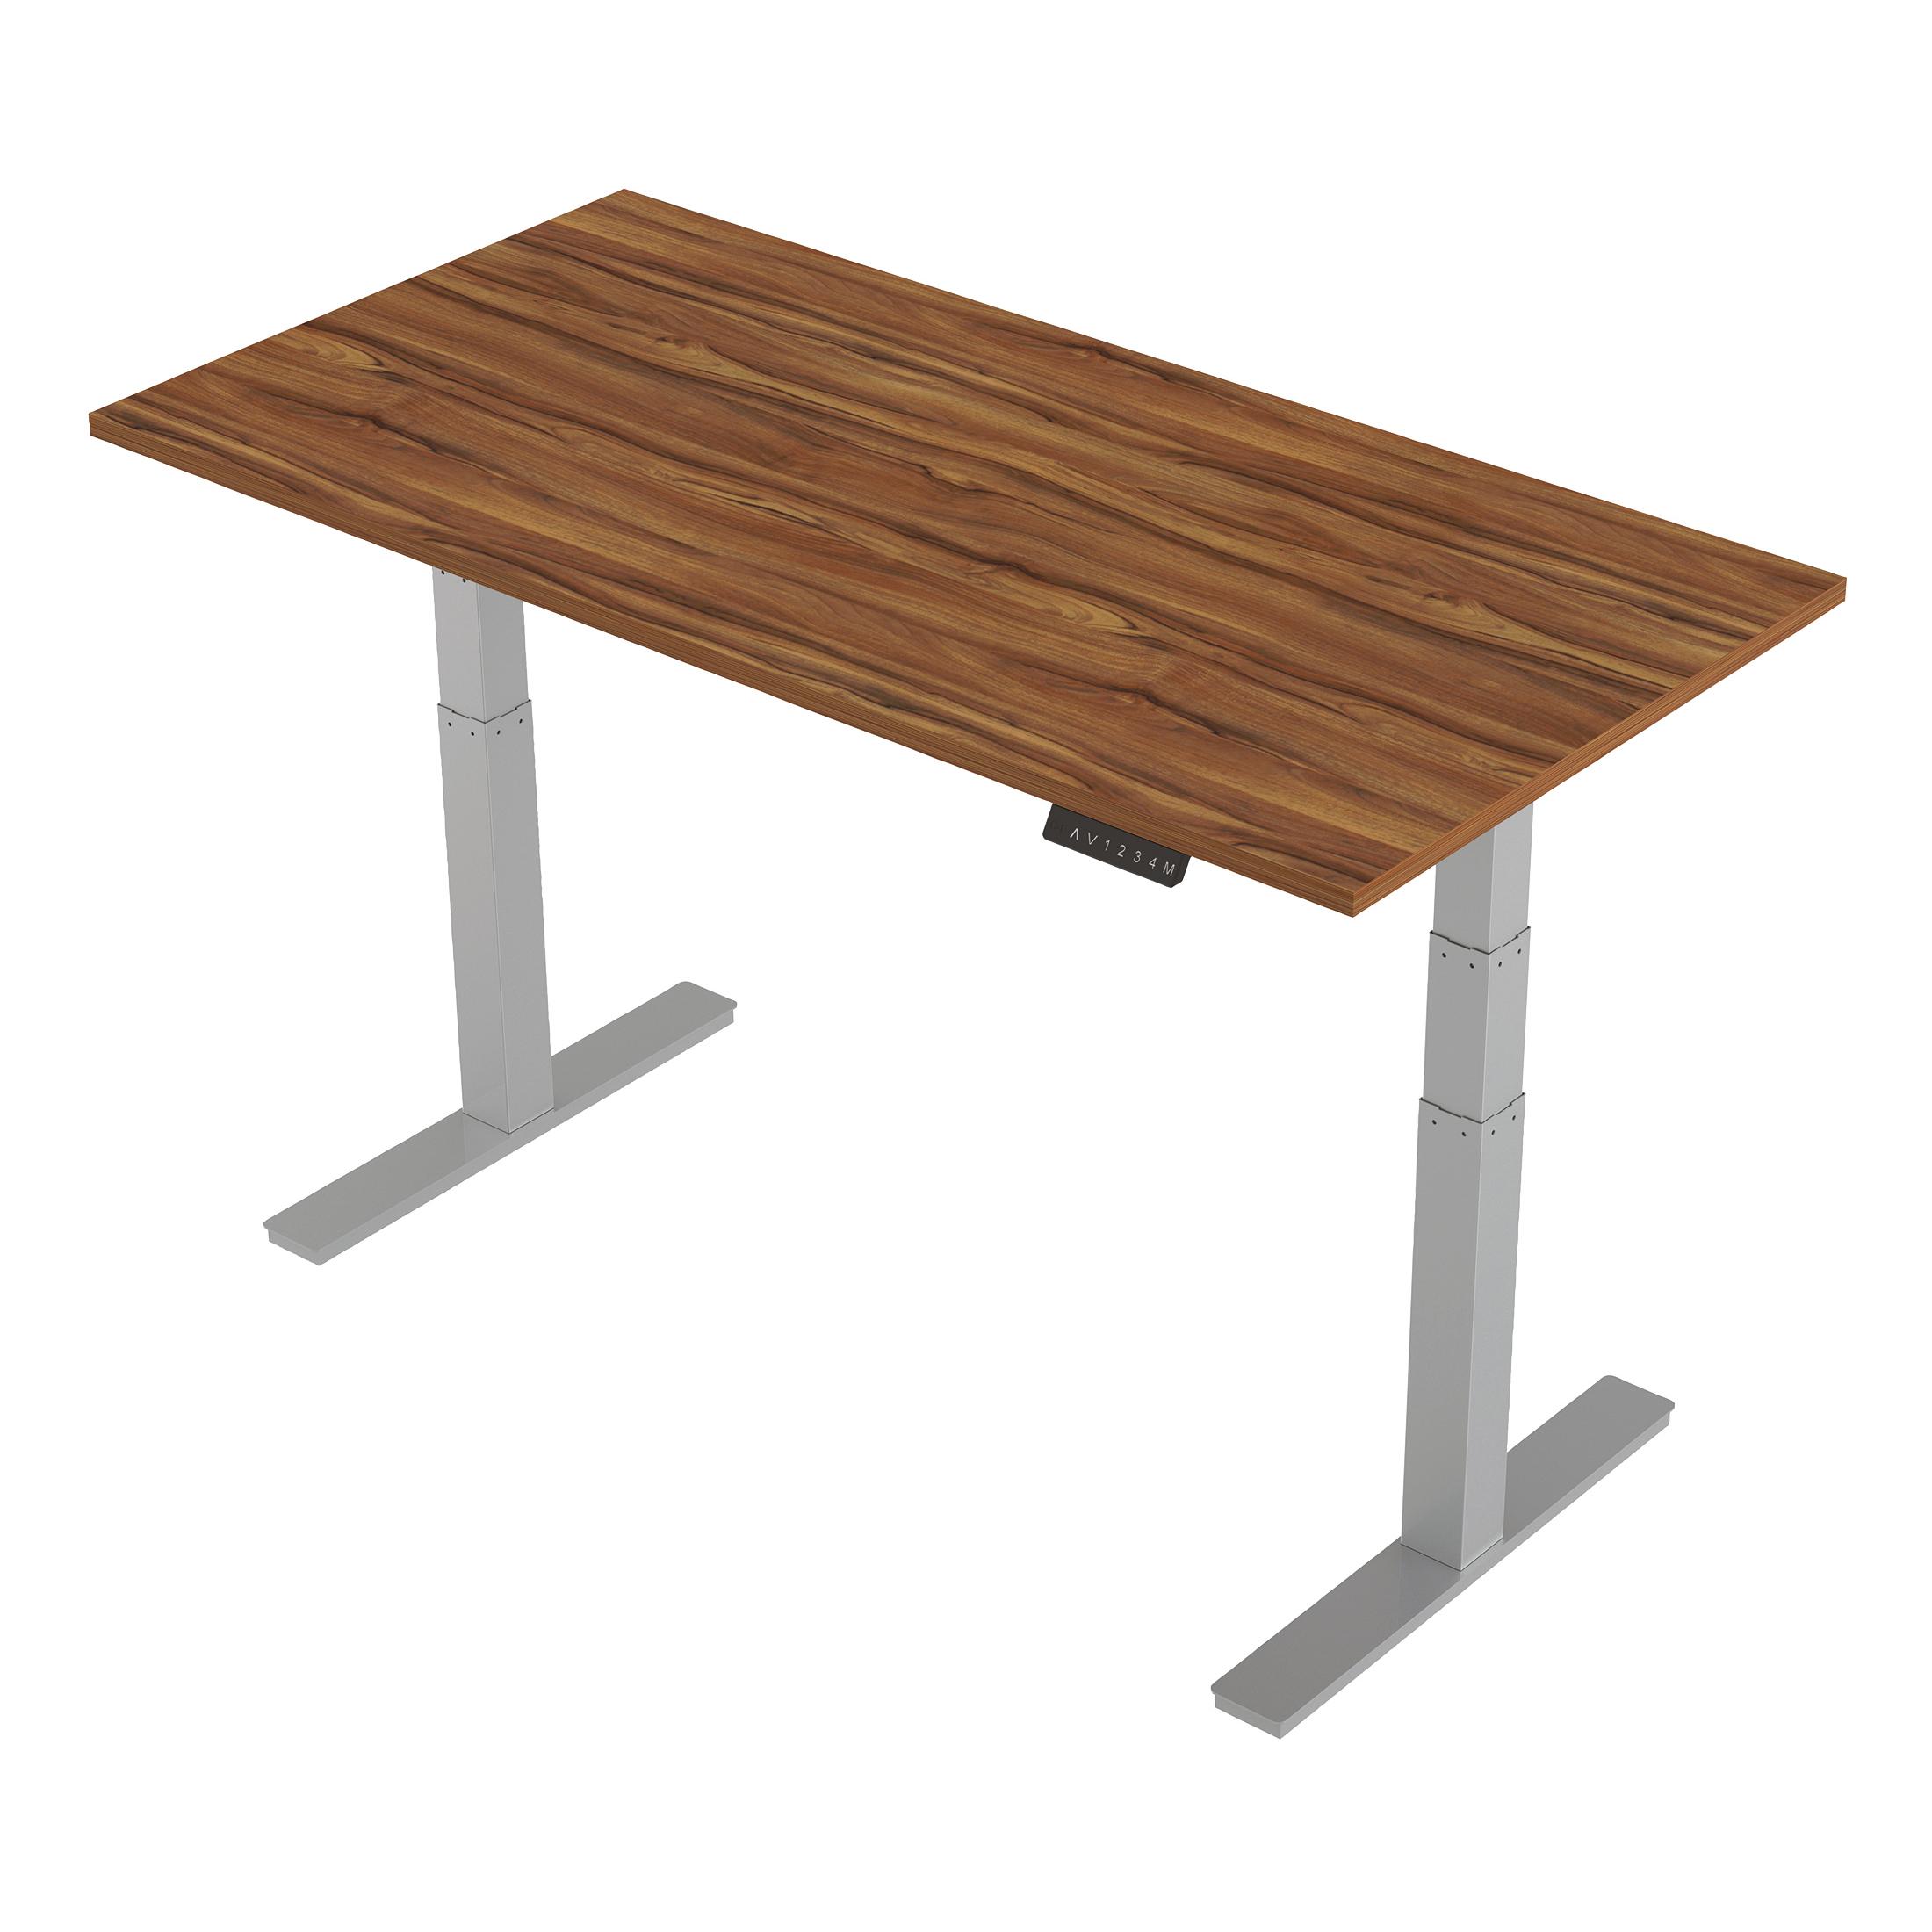 Trexus Sit-Stand Desk Height-adjustable Silver Leg Frame 1600/800mm Walnut Ref HA01007